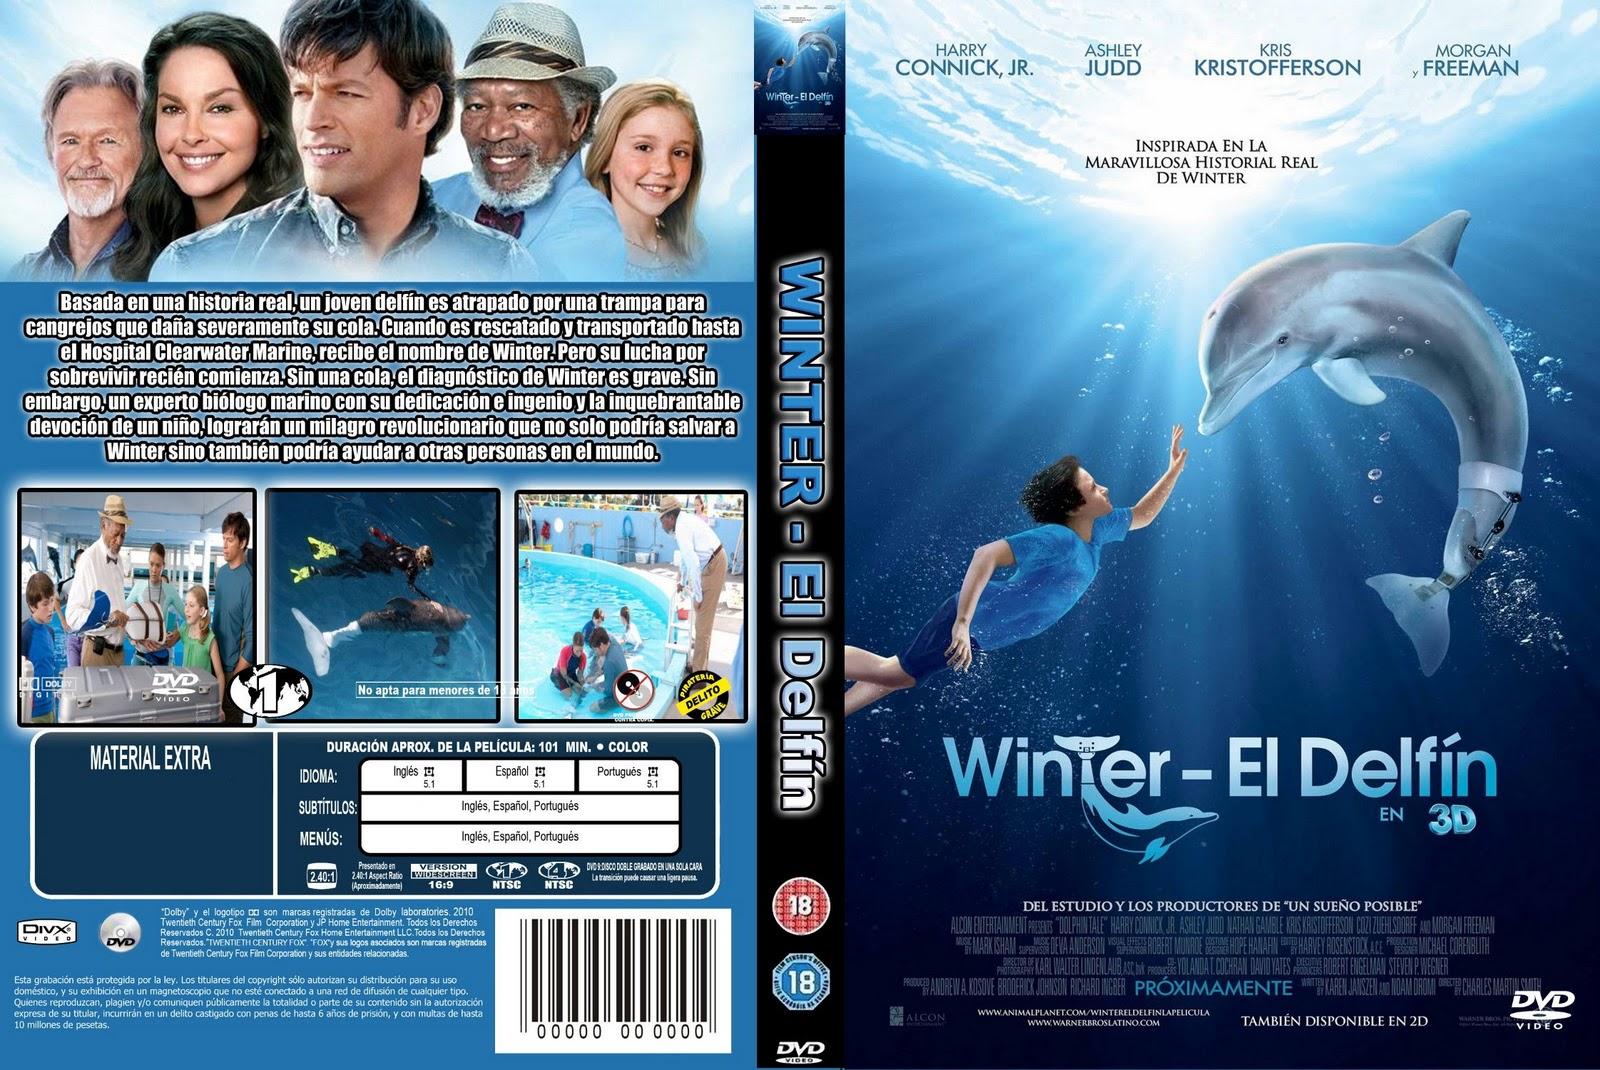 http://3.bp.blogspot.com/-OIS4BmWFMlg/TutEdKoLUCI/AAAAAAAABFE/Y2bokJflq9Q/s1600/Winter_-_El_Delfin_-_Custom_por_jorgedenis_%255Bdvd%255D_80.jpg